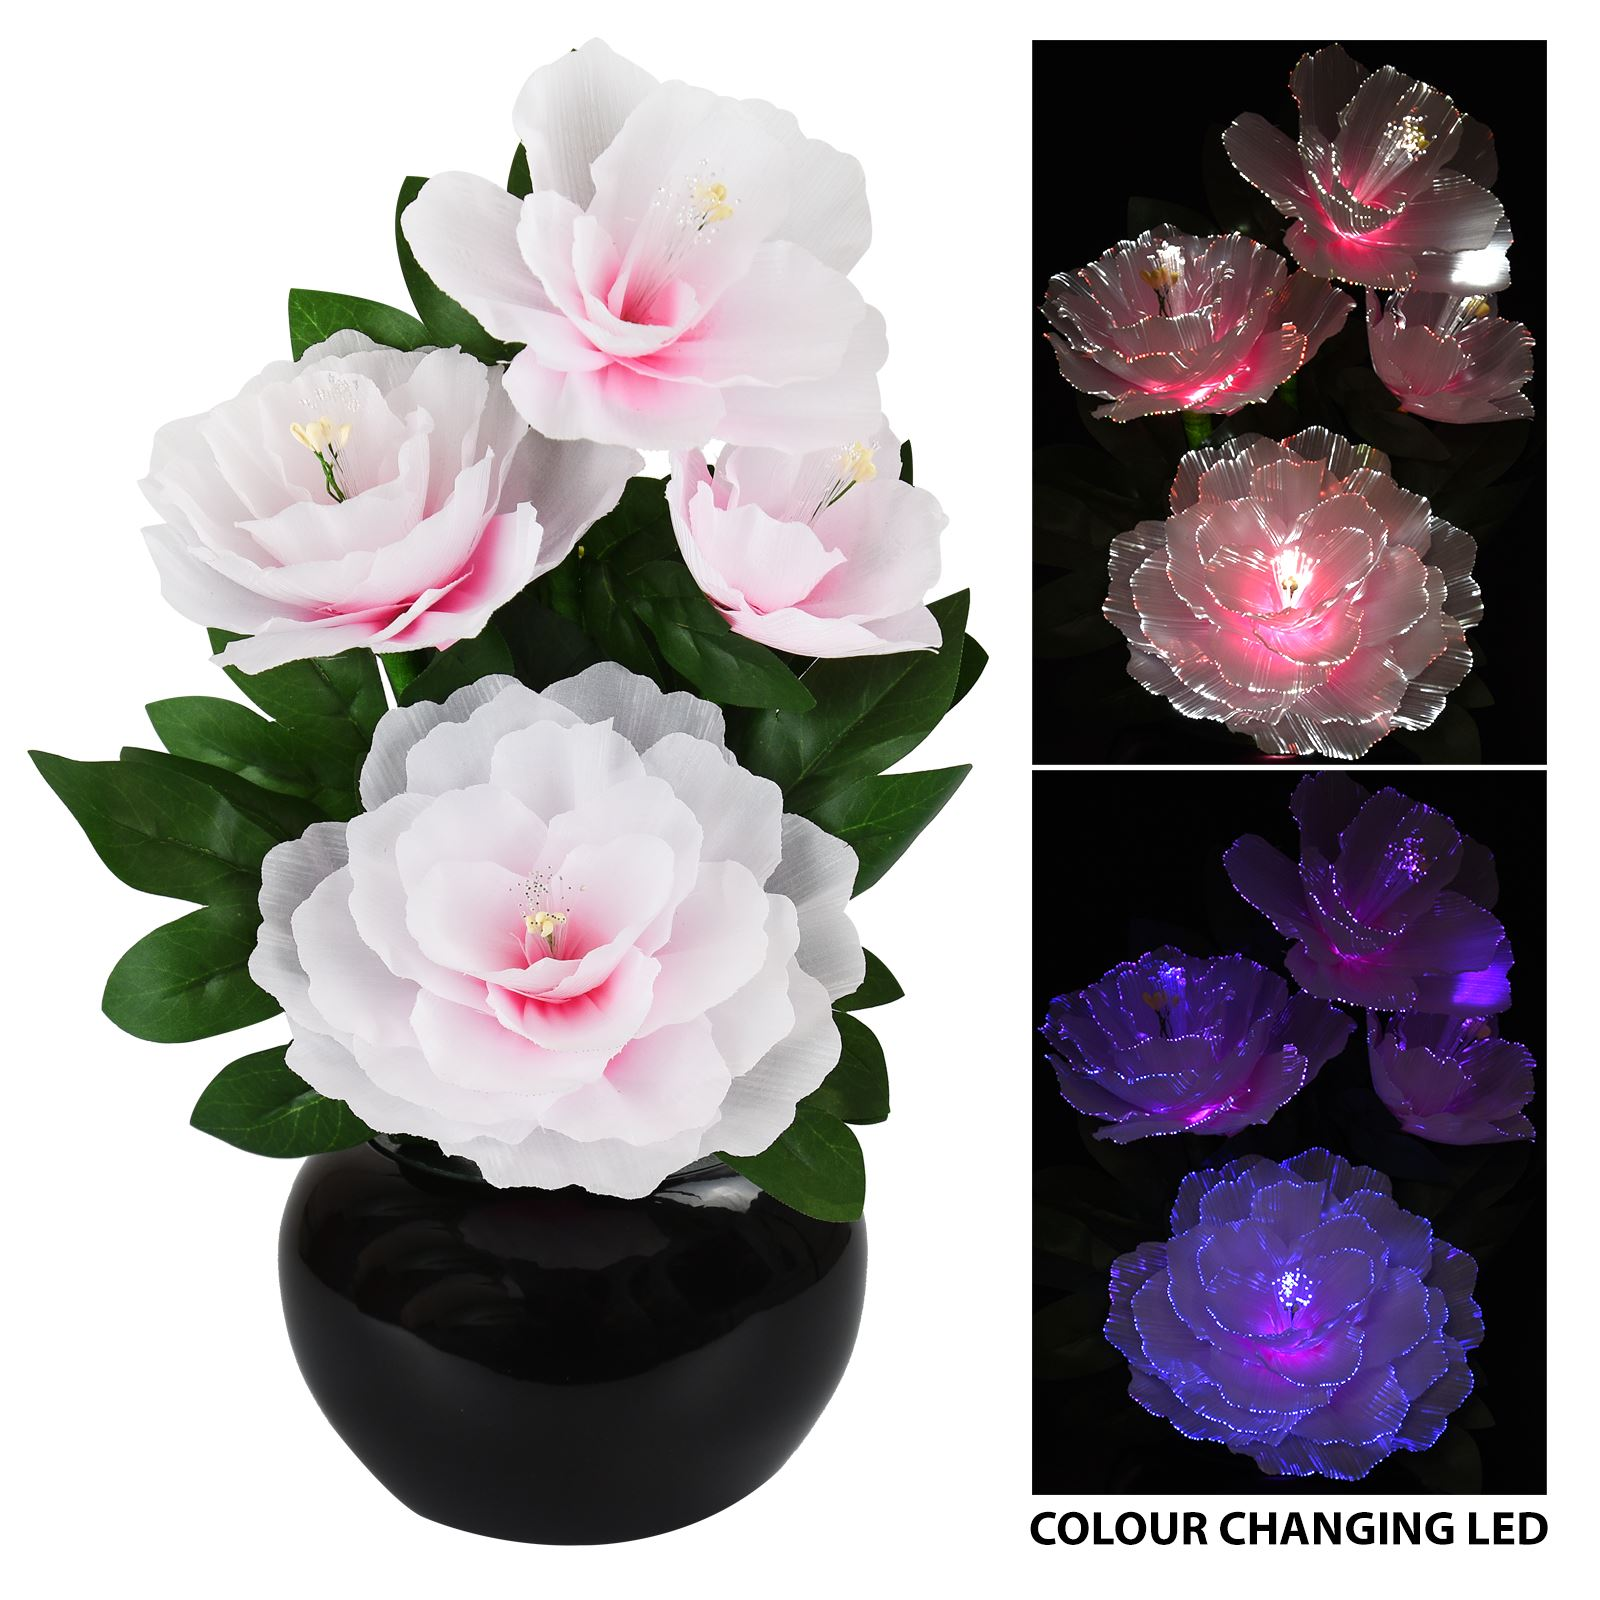 Rgb colour changing flower vase mood light display led fibre optic rgb colour changing flower vase mood light display reviewsmspy